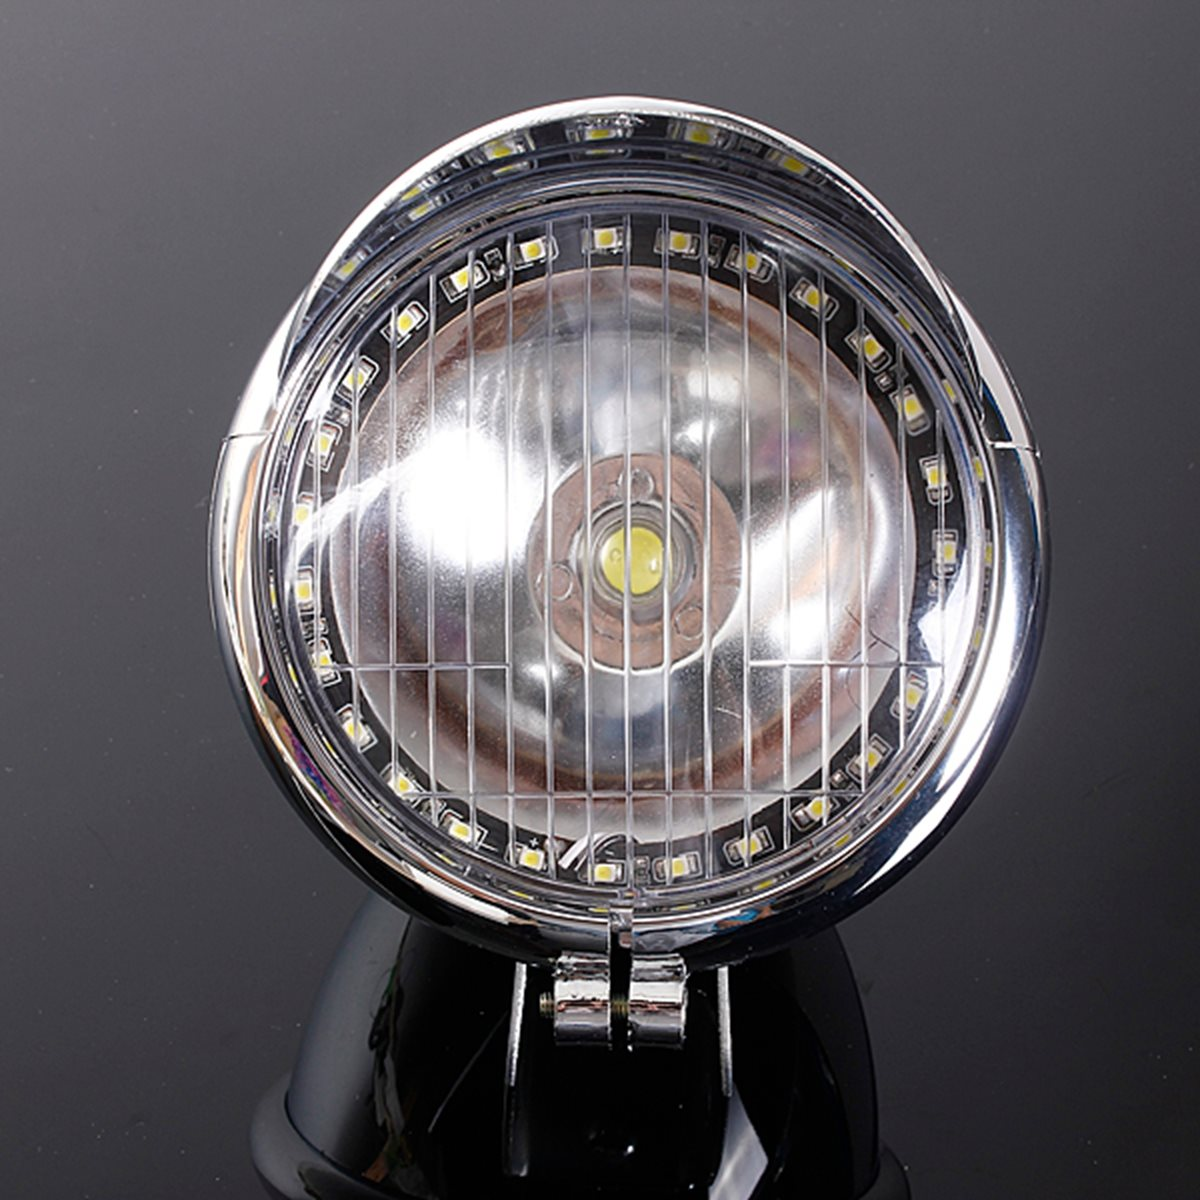 Prix pour 12 V Moto 27LED Angel Eye Lumière Brouillard Lumière 1COB LED Phare Lampe Pour Harley Chopper/Bobber Cruiser